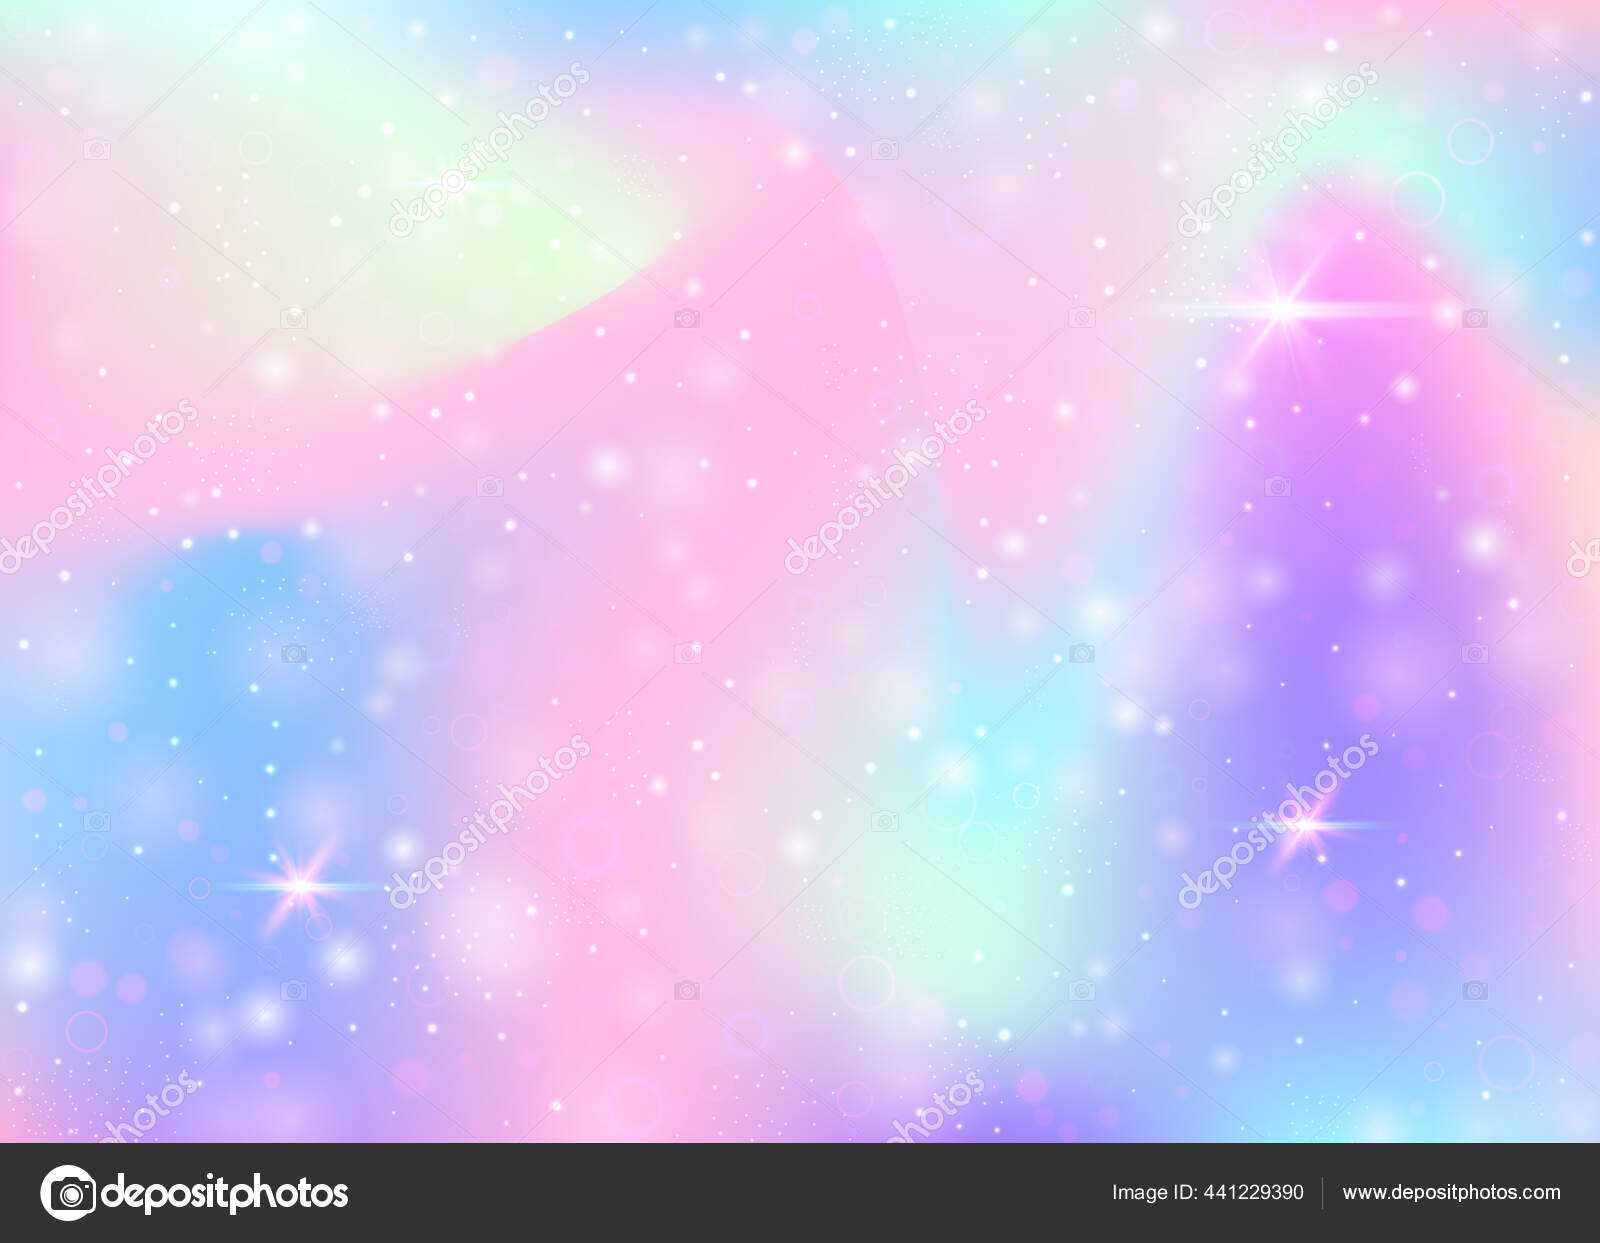 Latar Belakang Holografik Dengan Jala Pelangi Warna Warni Bendera Alam —  Stok Vektor © Olga_hmelevska #441229390